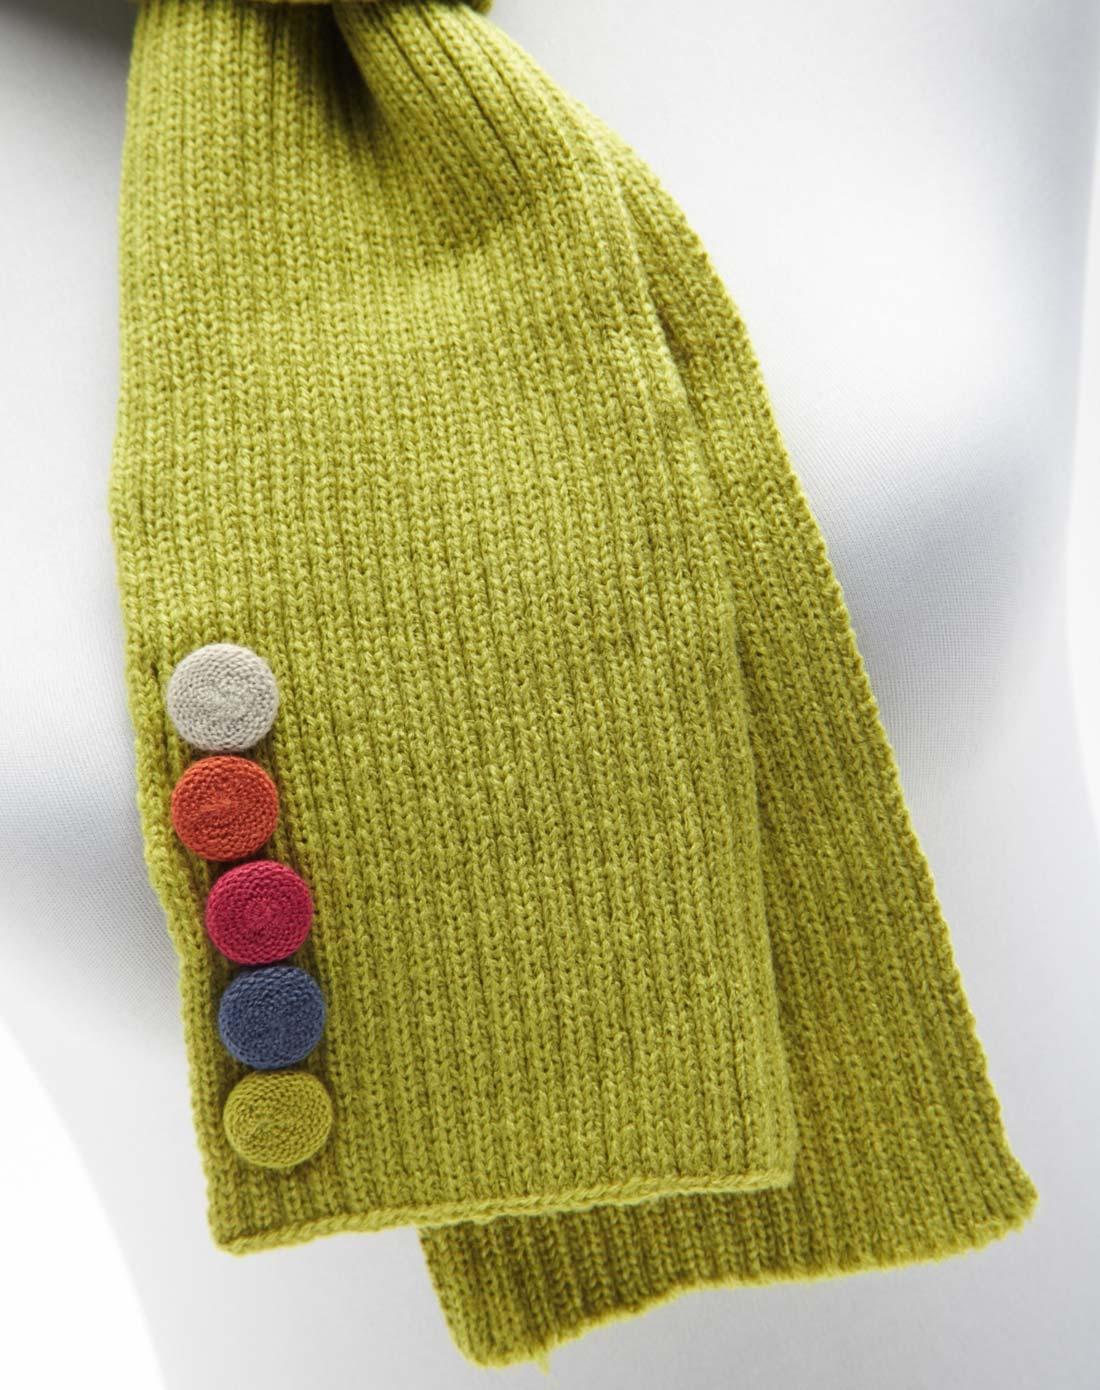 penelope英式纽扣装饰绒线编织围巾(青草绿)